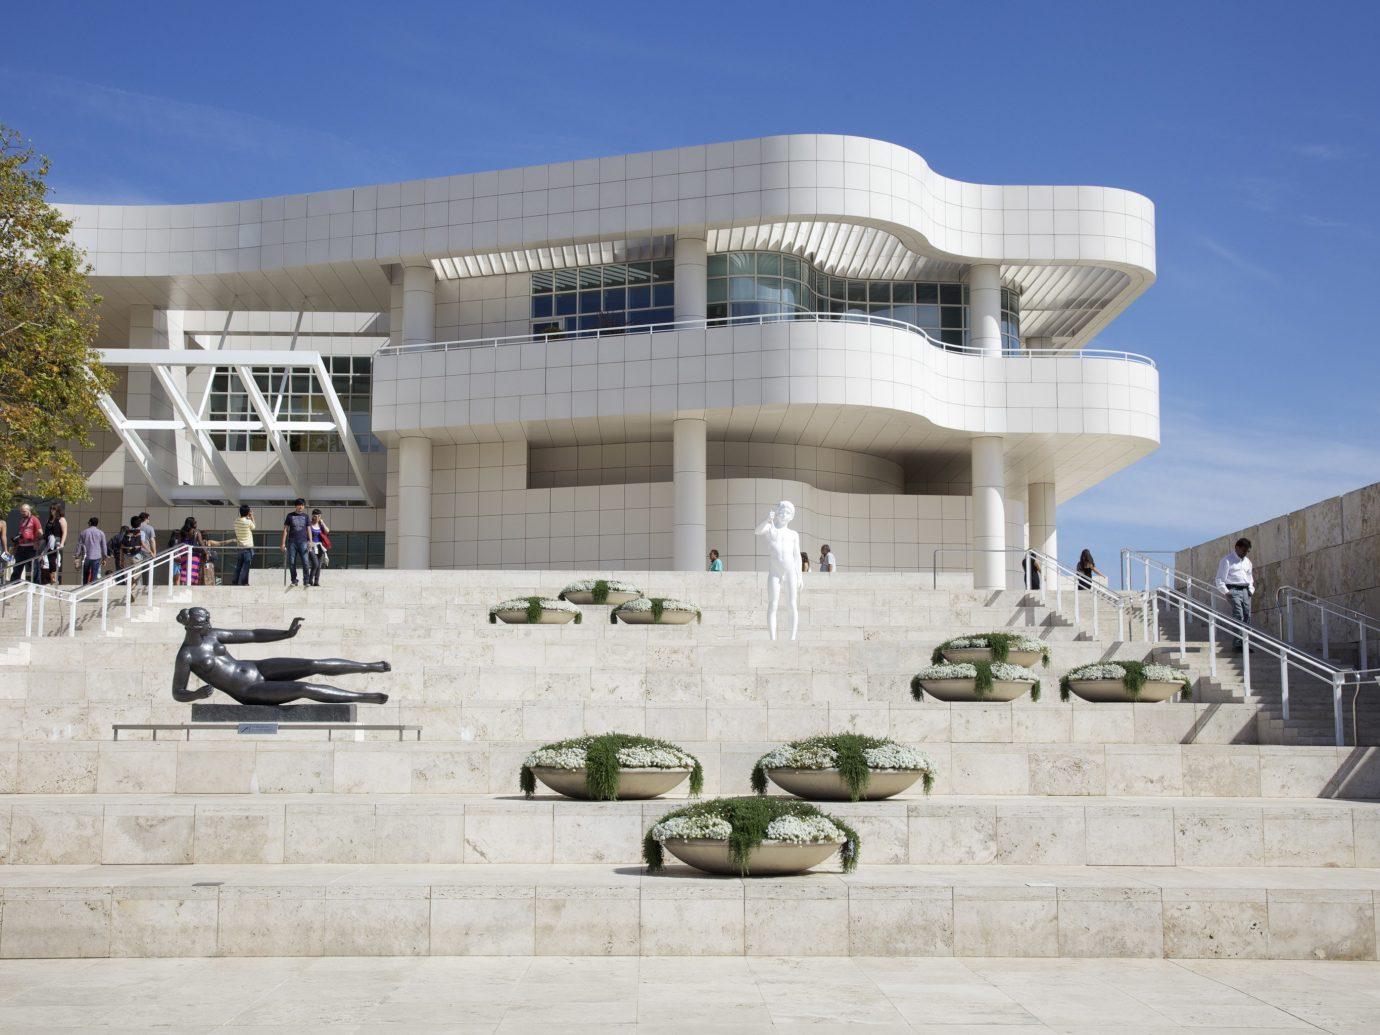 Trip Ideas outdoor plaza building Architecture facade headquarters tourist attraction estate convention center Deck